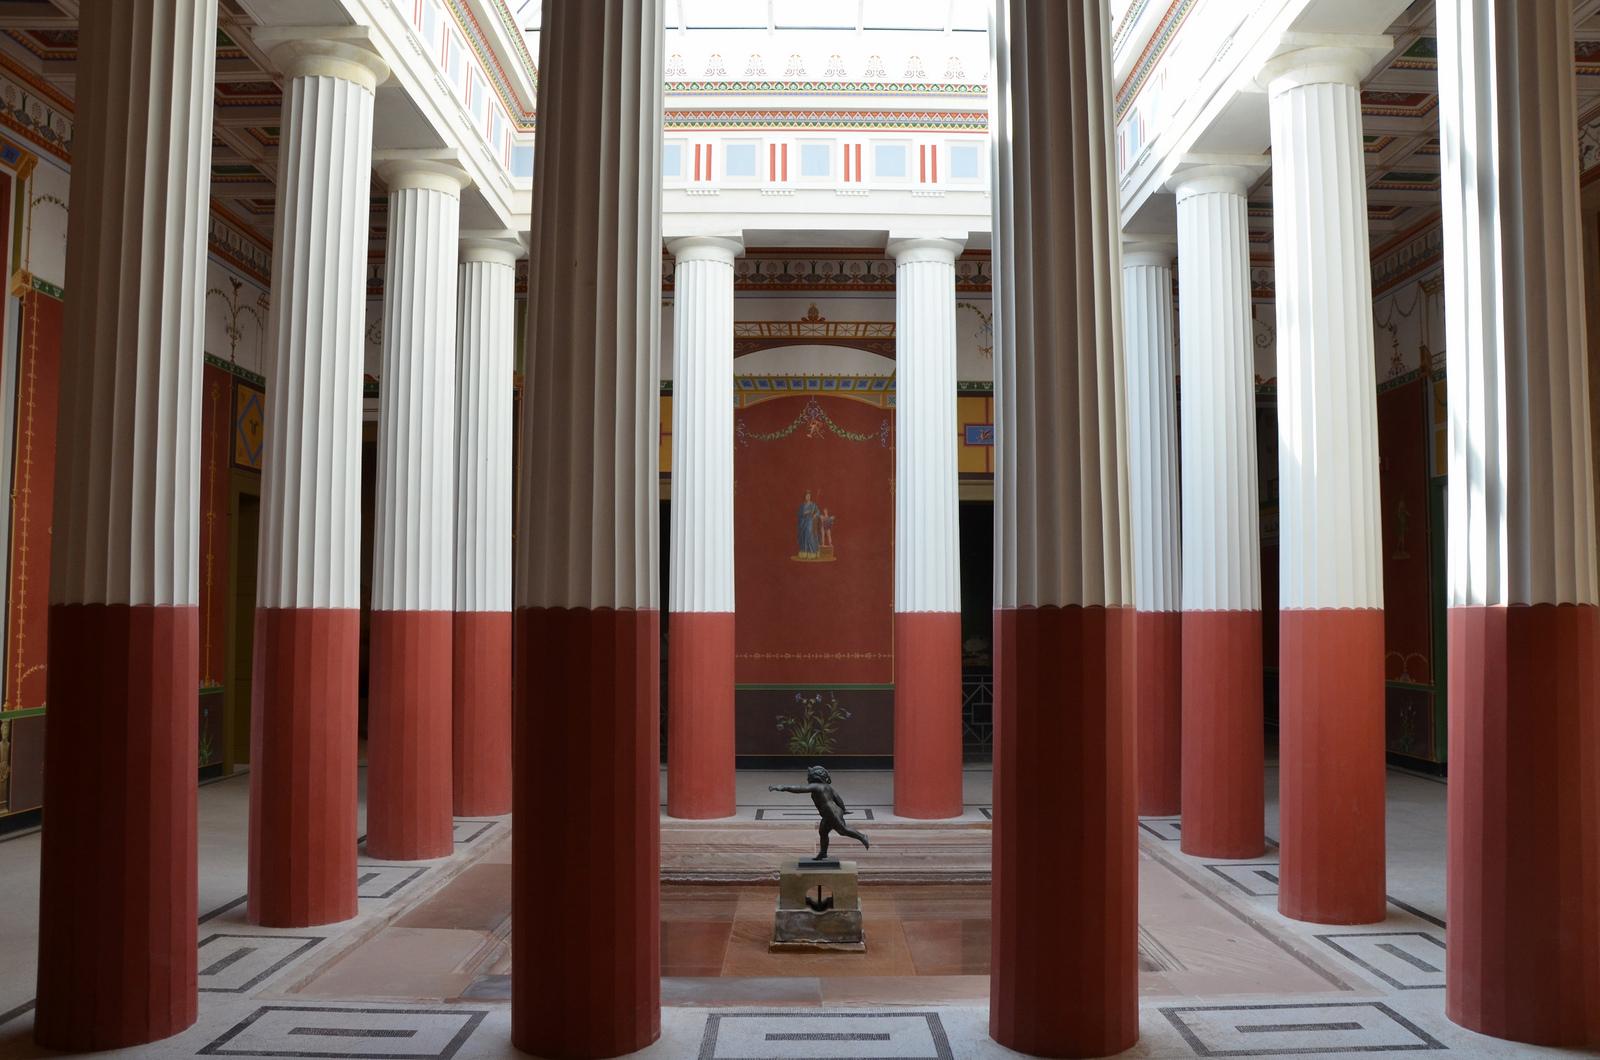 The Pompeiianum A Reconstructed Roman Villa In The German